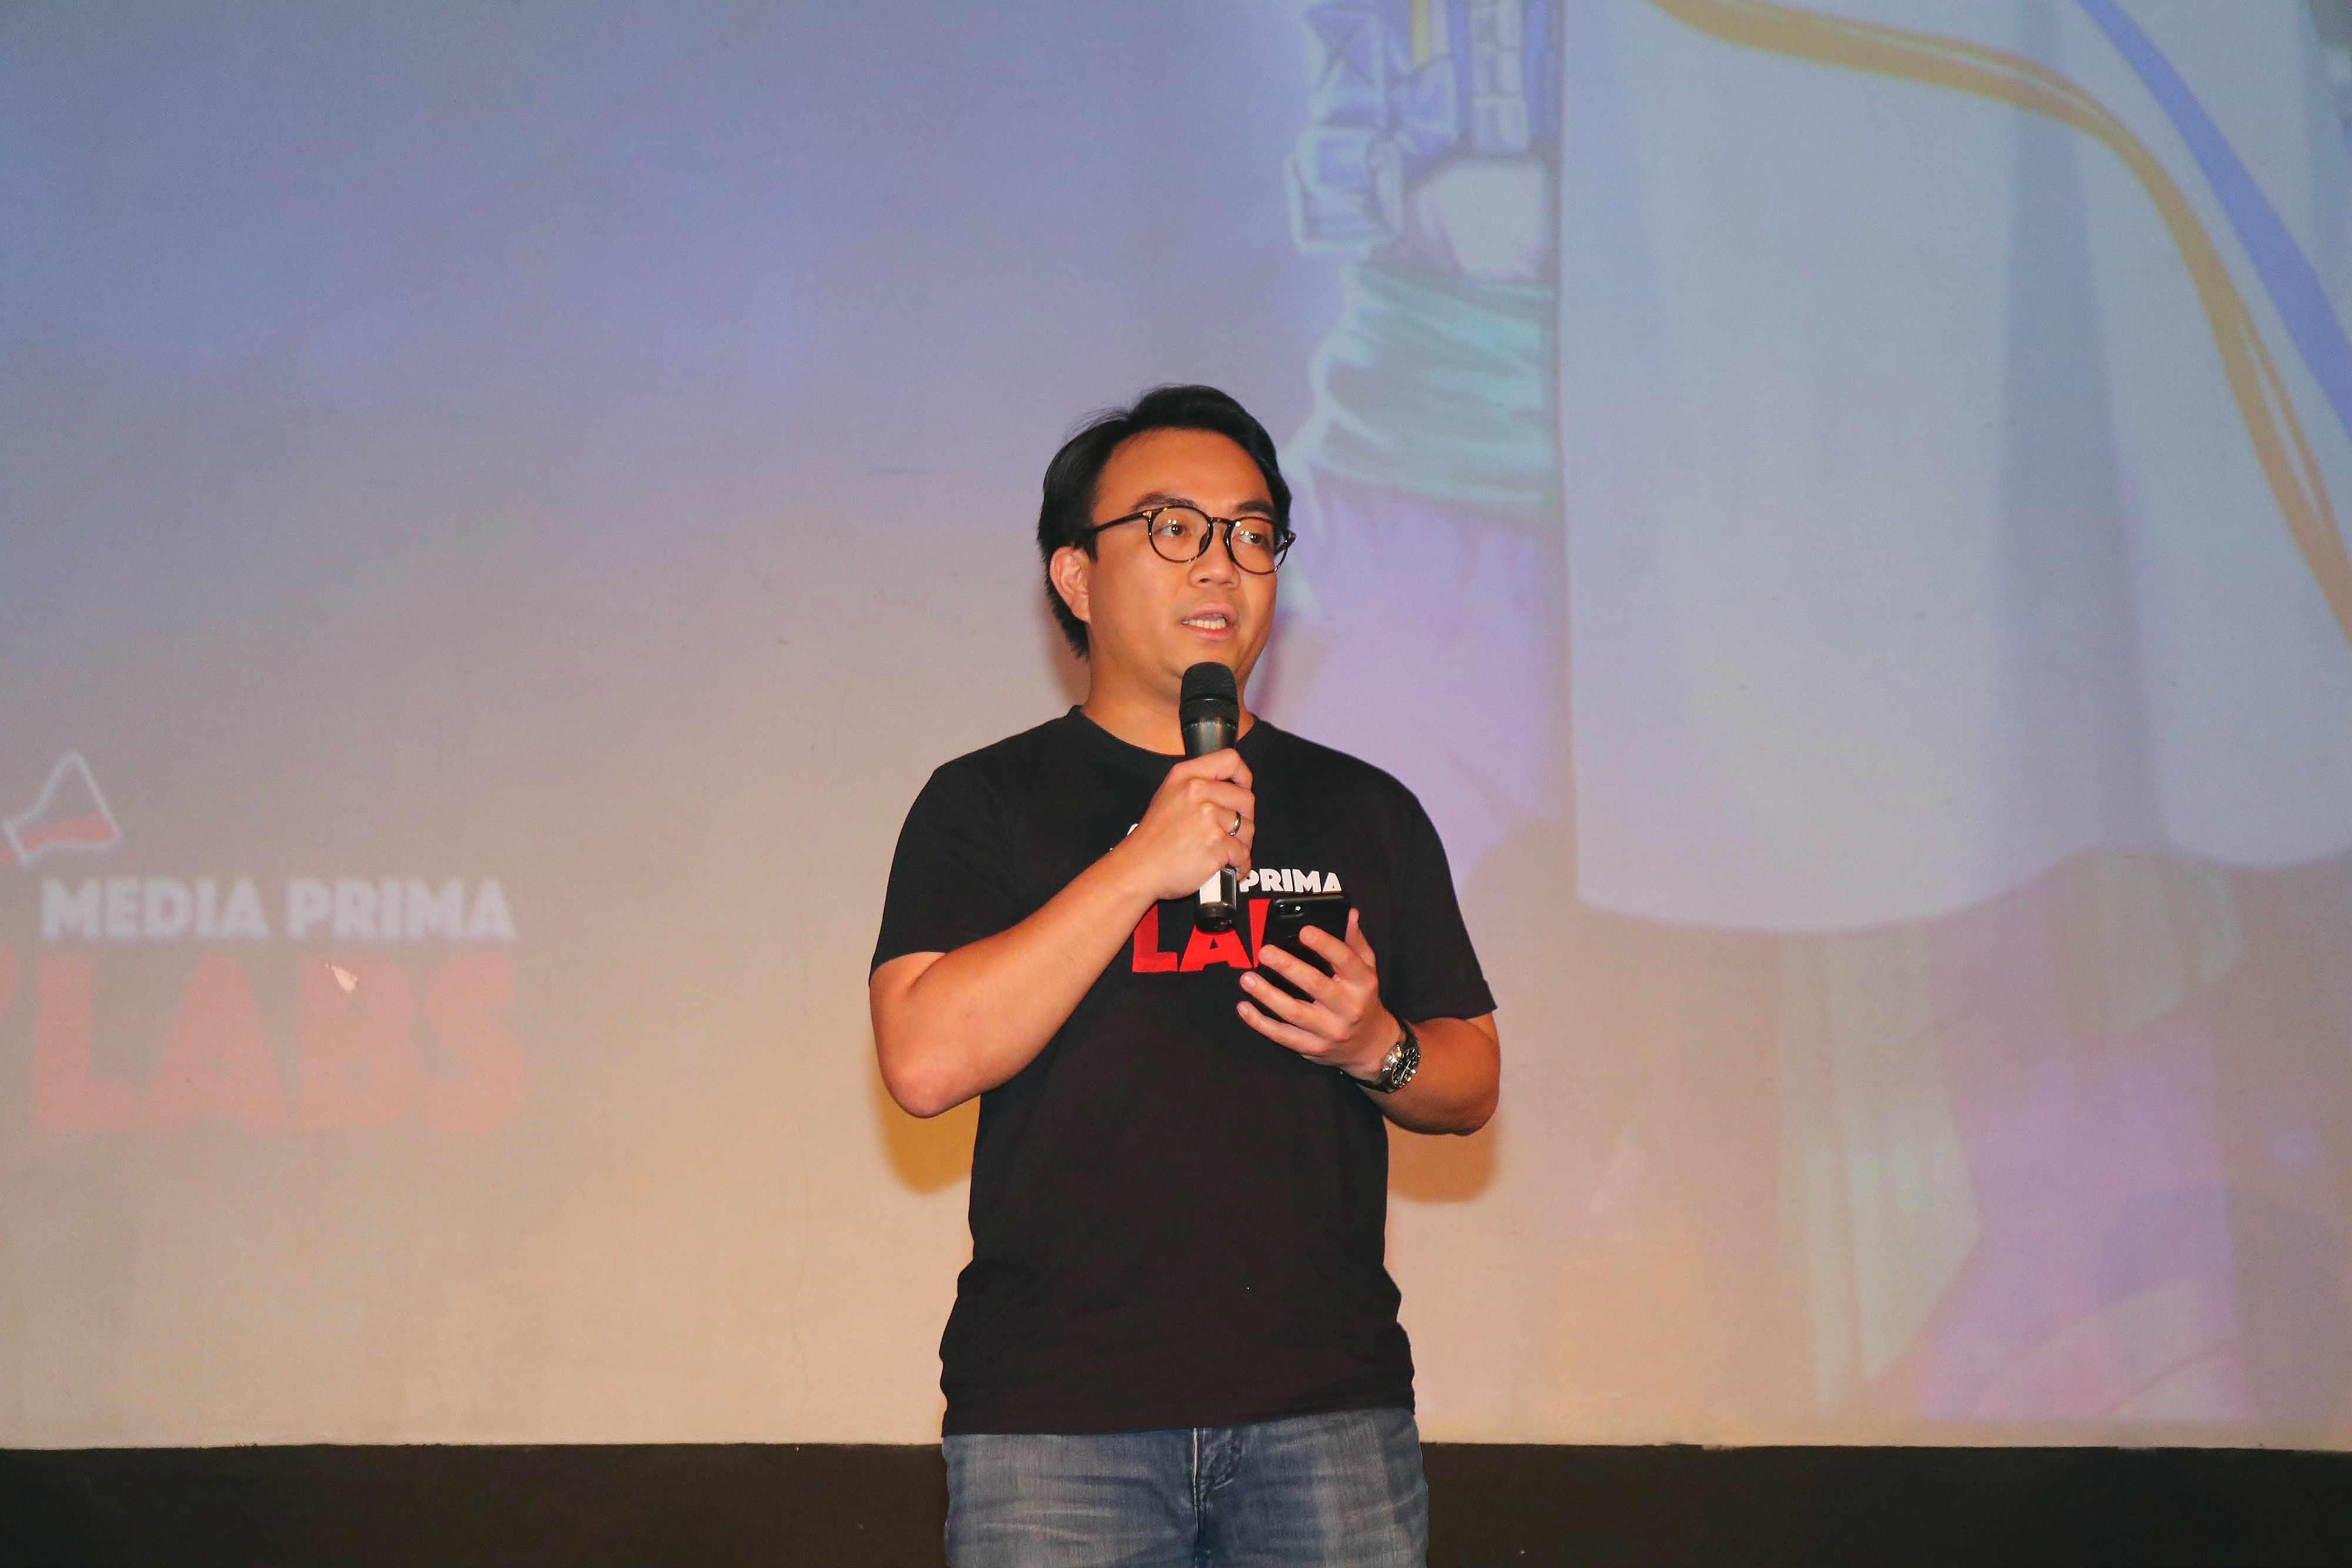 Ketua Pegawai Eksekutif Media Prima Digital, Rafiq Razali